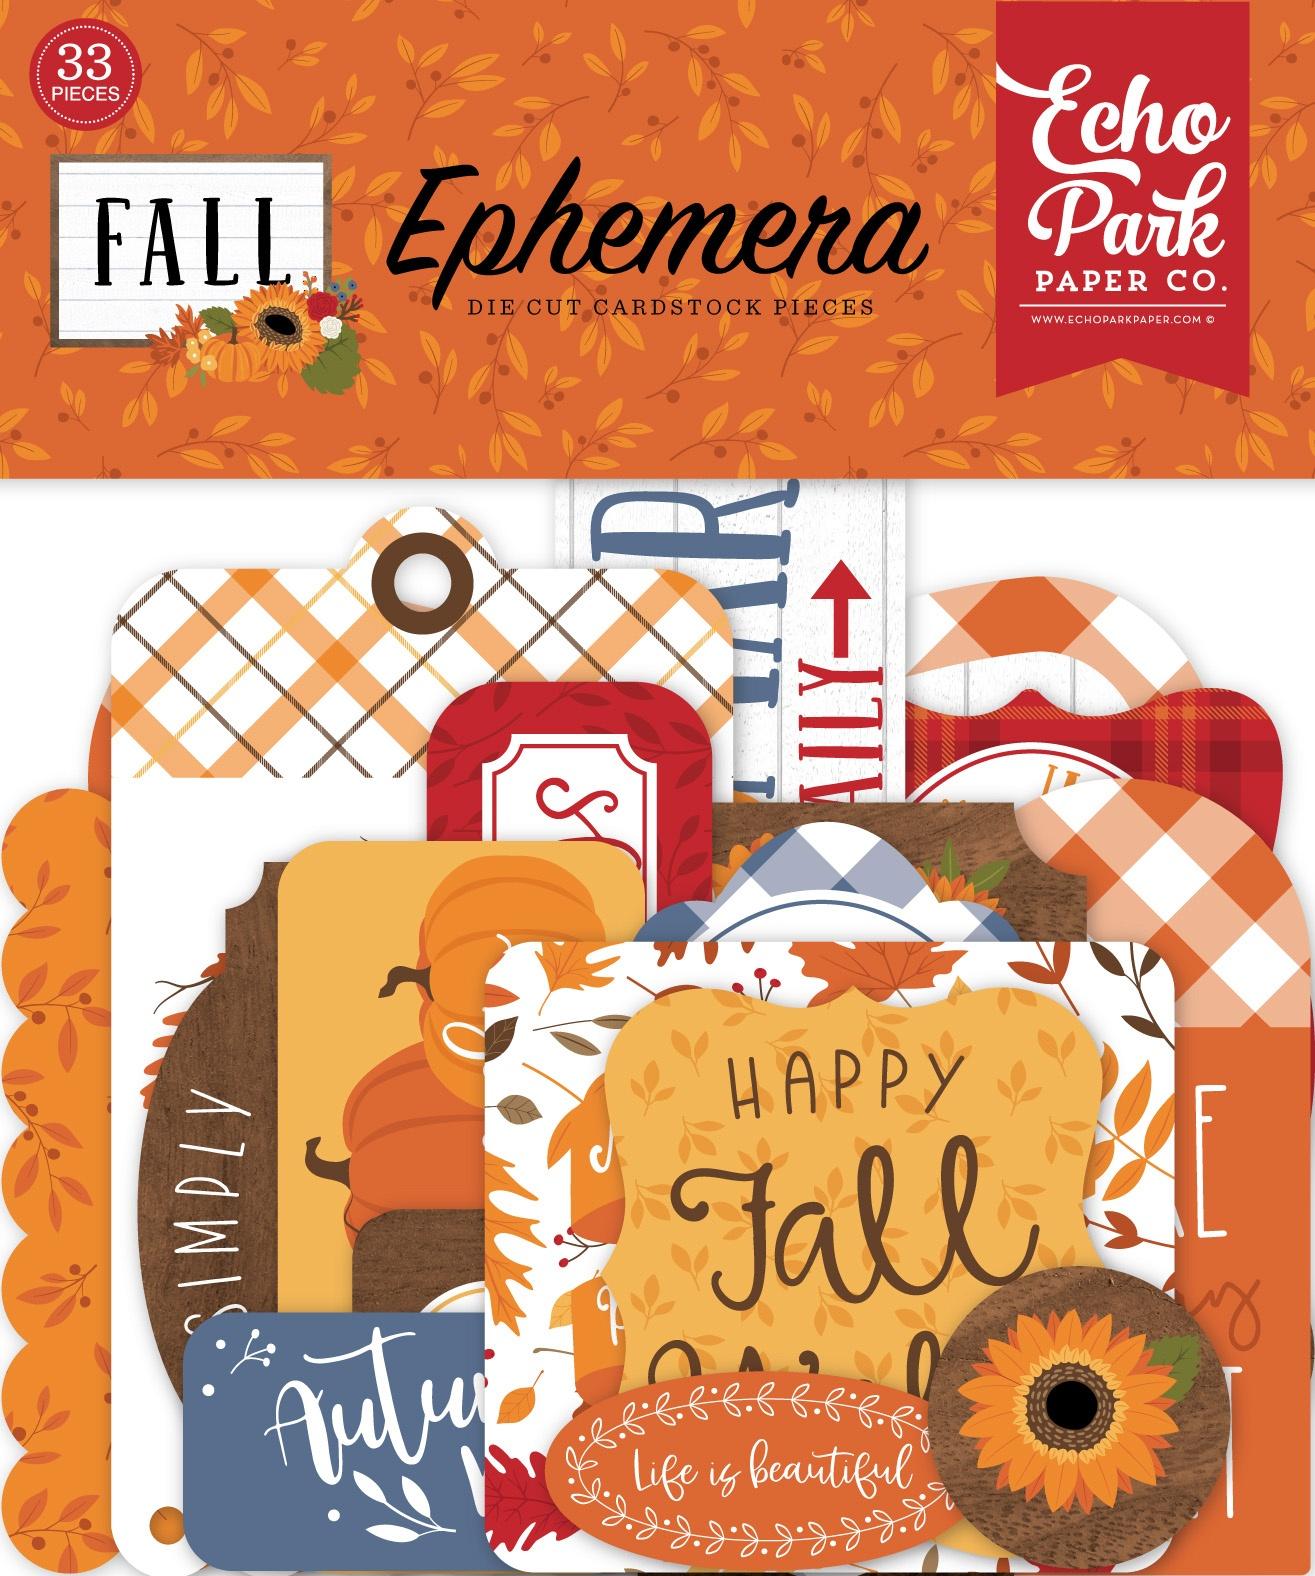 Echo Park - Fall - Ephemera